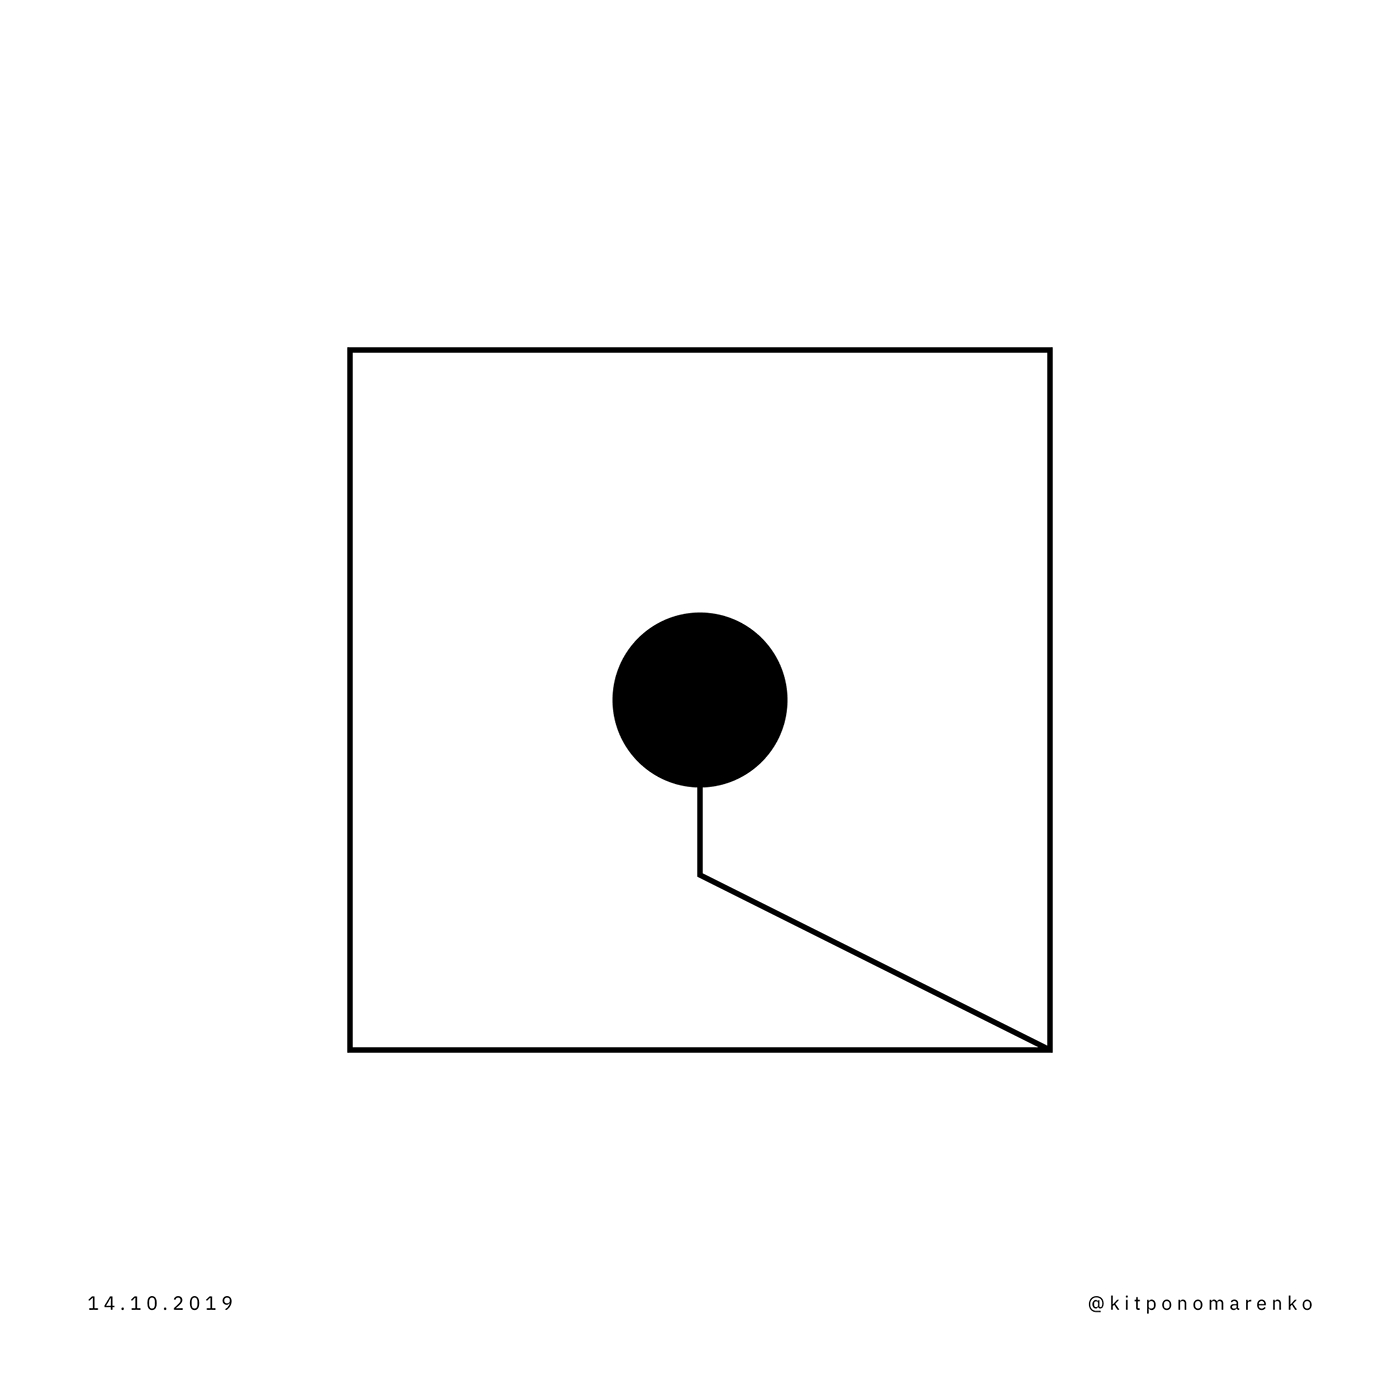 abstract art artwork digital geometric graphic design  ILLUSTRATION  minimal Minimalism Suprematism